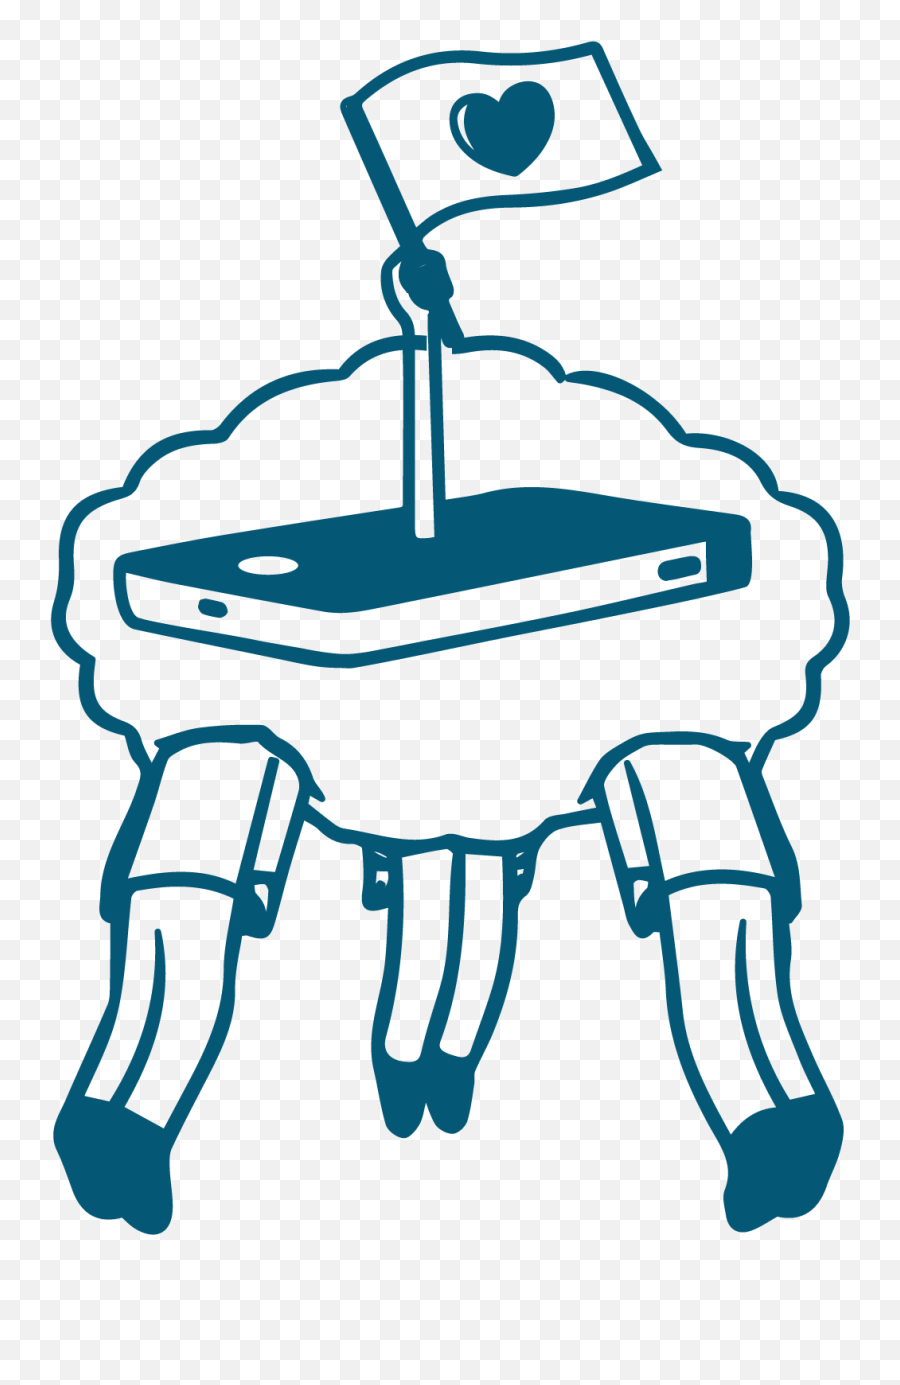 Curiocity Hk - Drawing Emoji,Faint Emoji